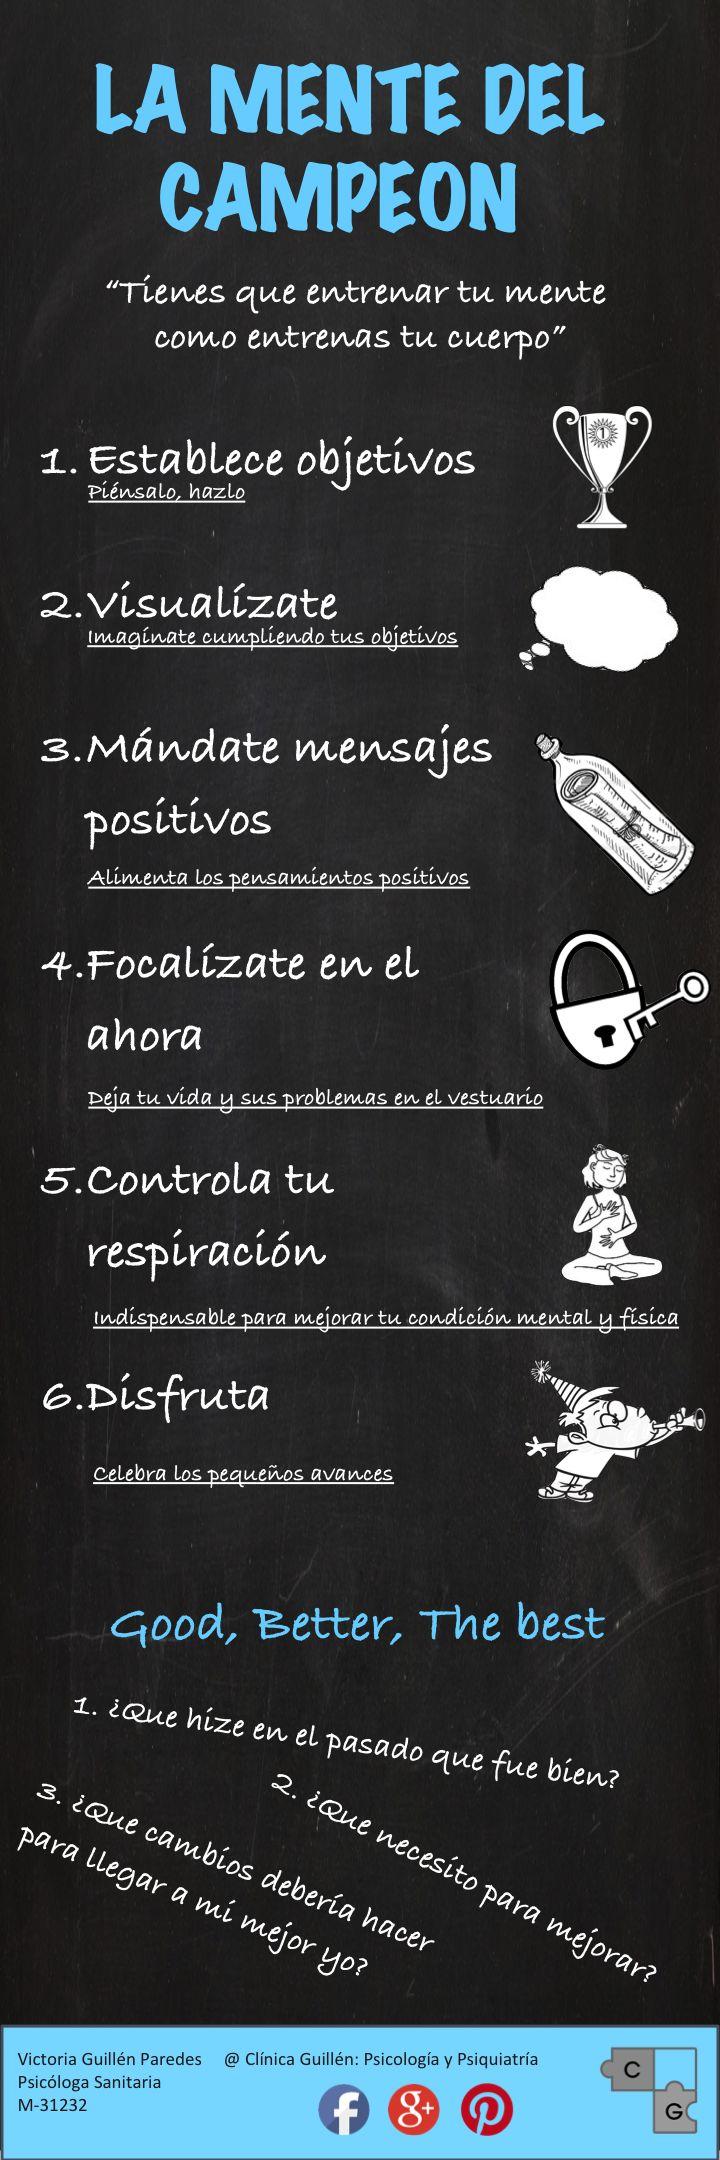 #psicologia #deporte #infografia #mentedelcampeon #psicologiadeportiva